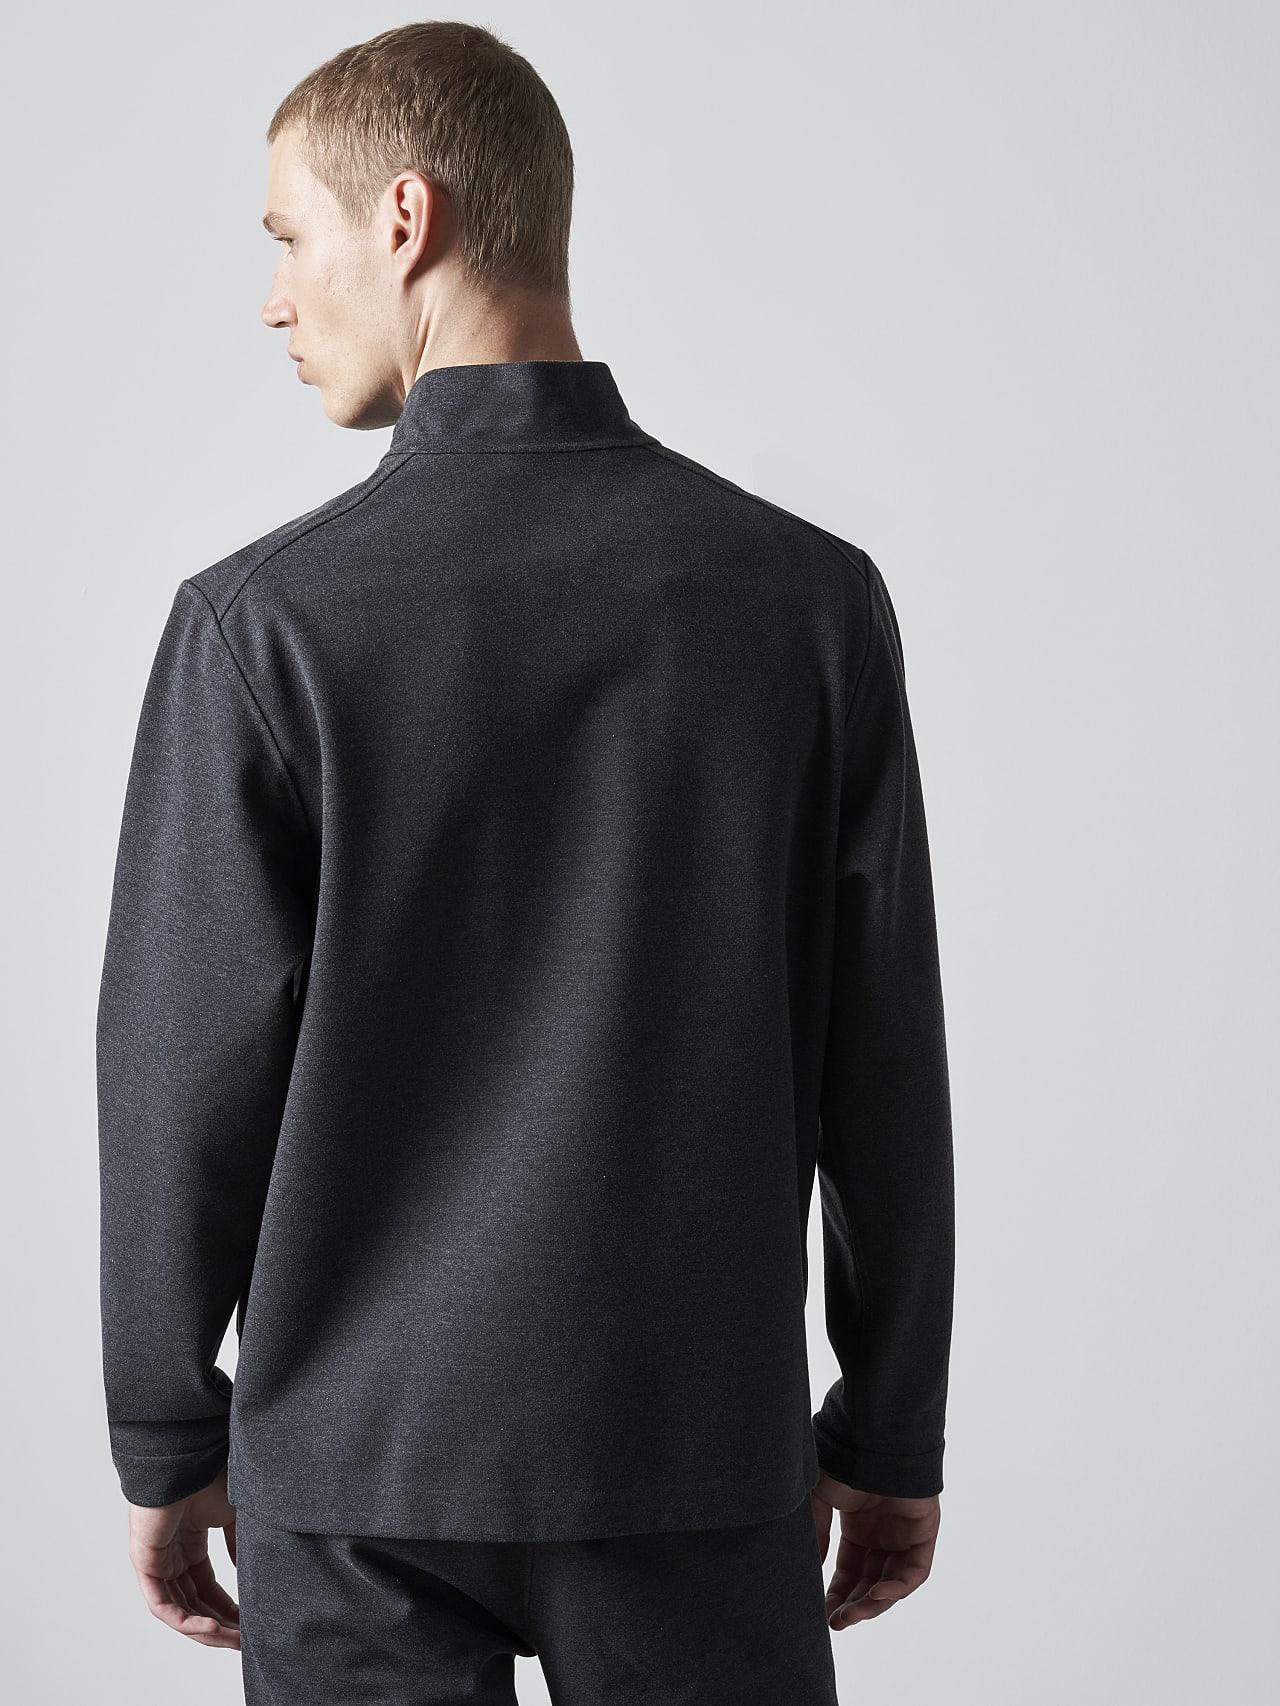 SROTO V1.Y5.02 Waterproof Half-Zip Sweatshirt dark grey / anthracite Front Main Alpha Tauri